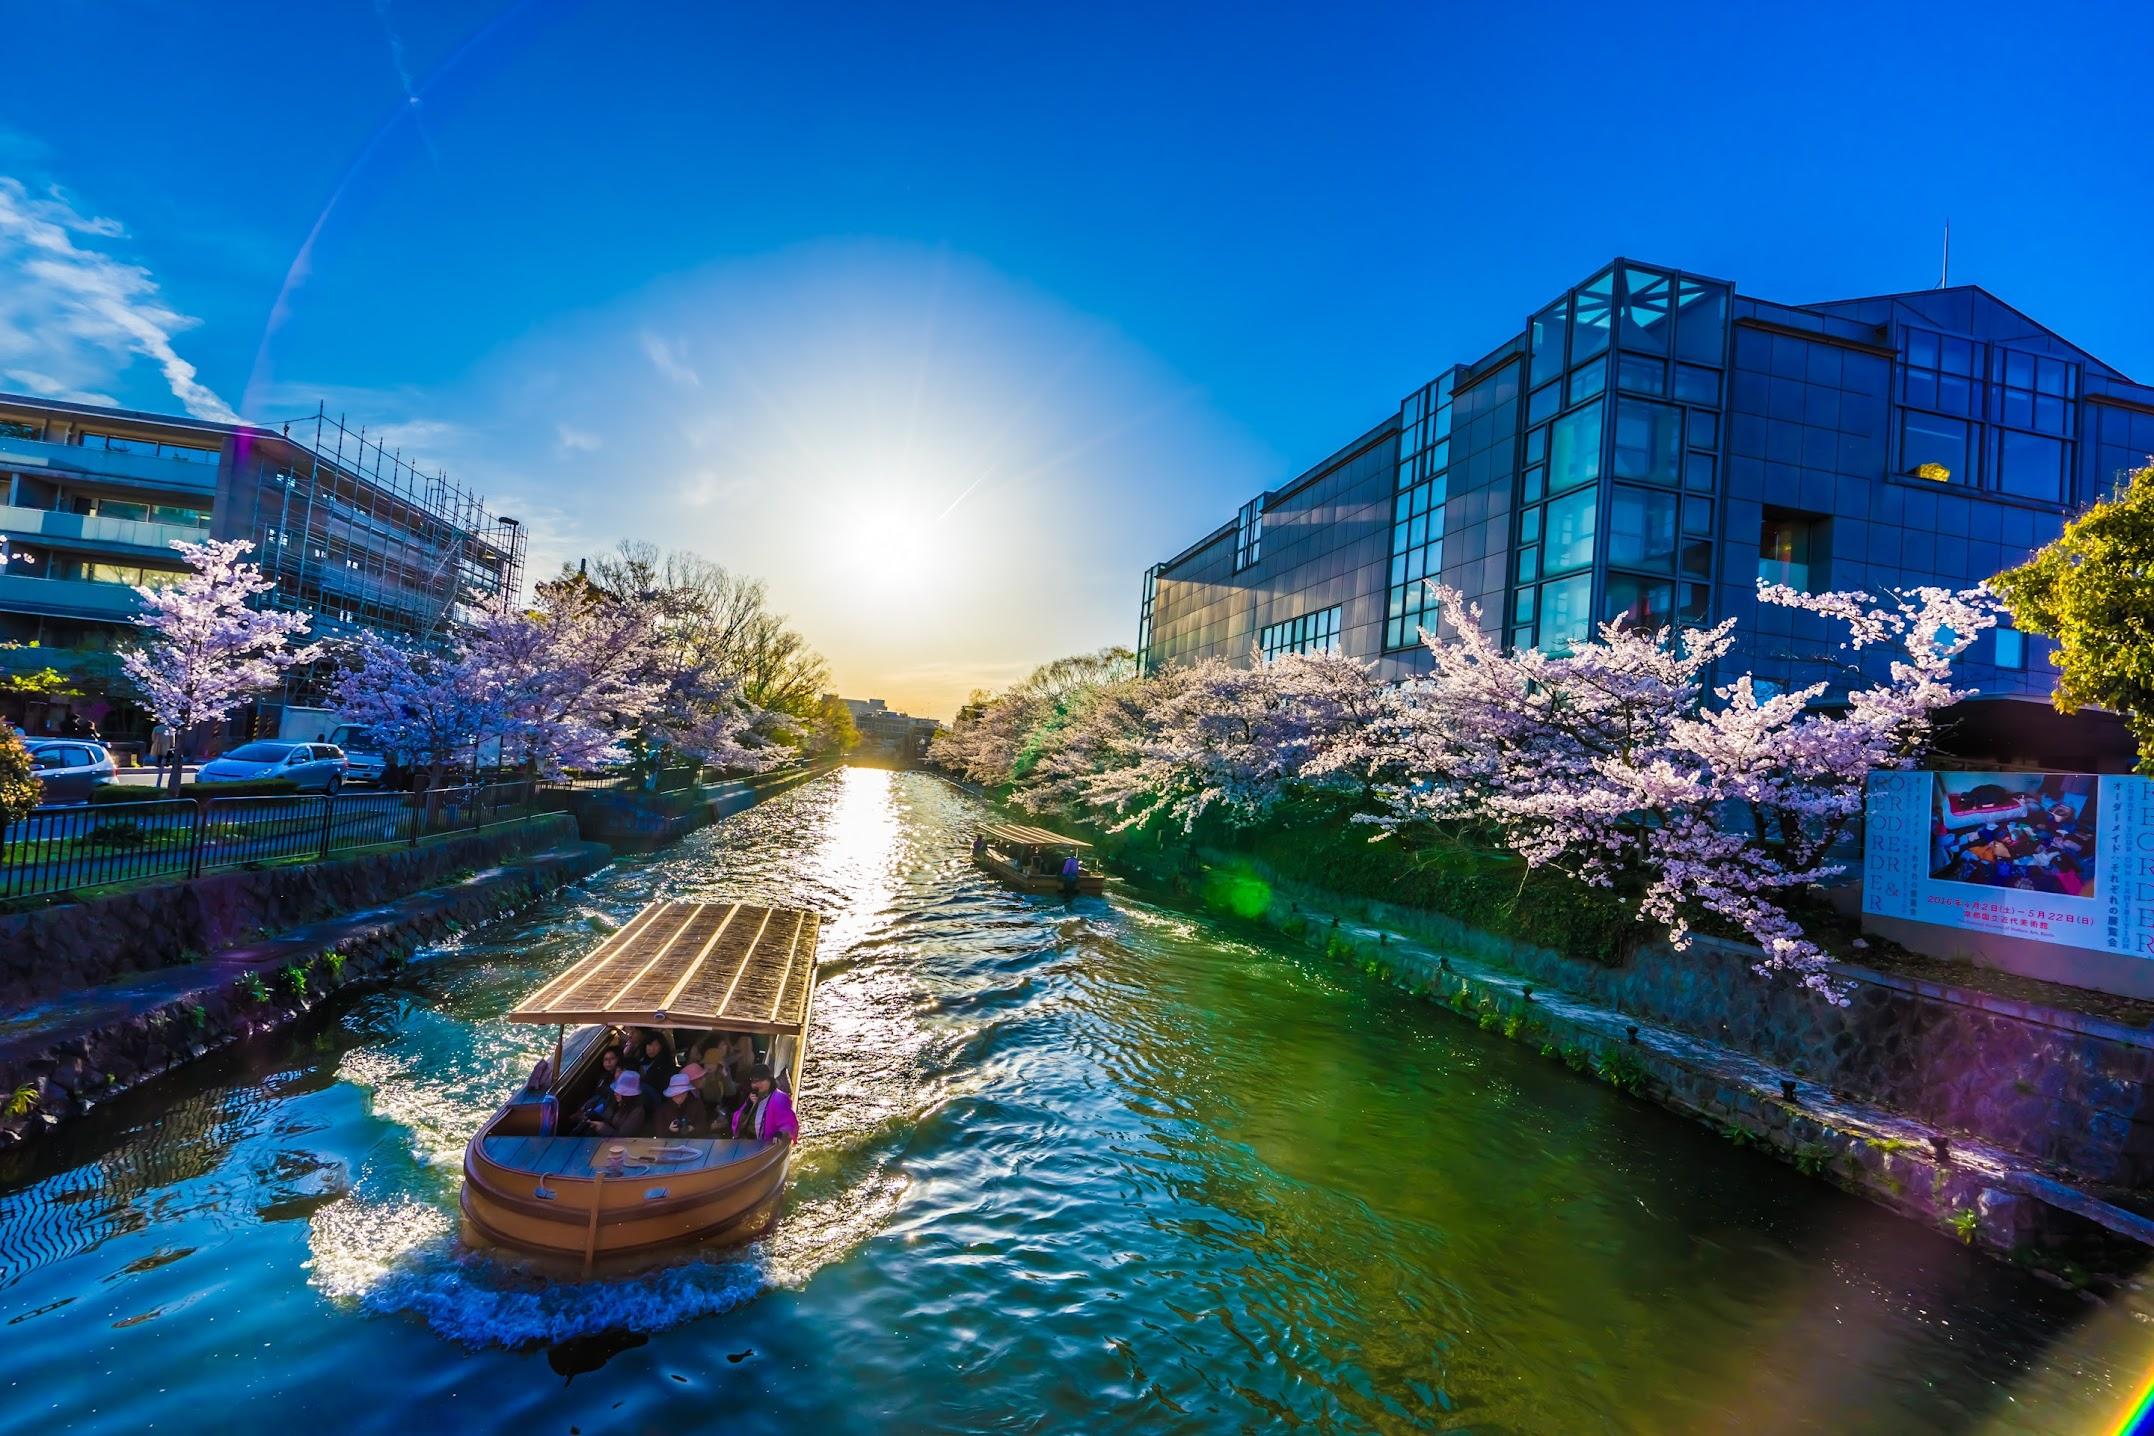 Kyoto okazaki canal cherry blossoms3